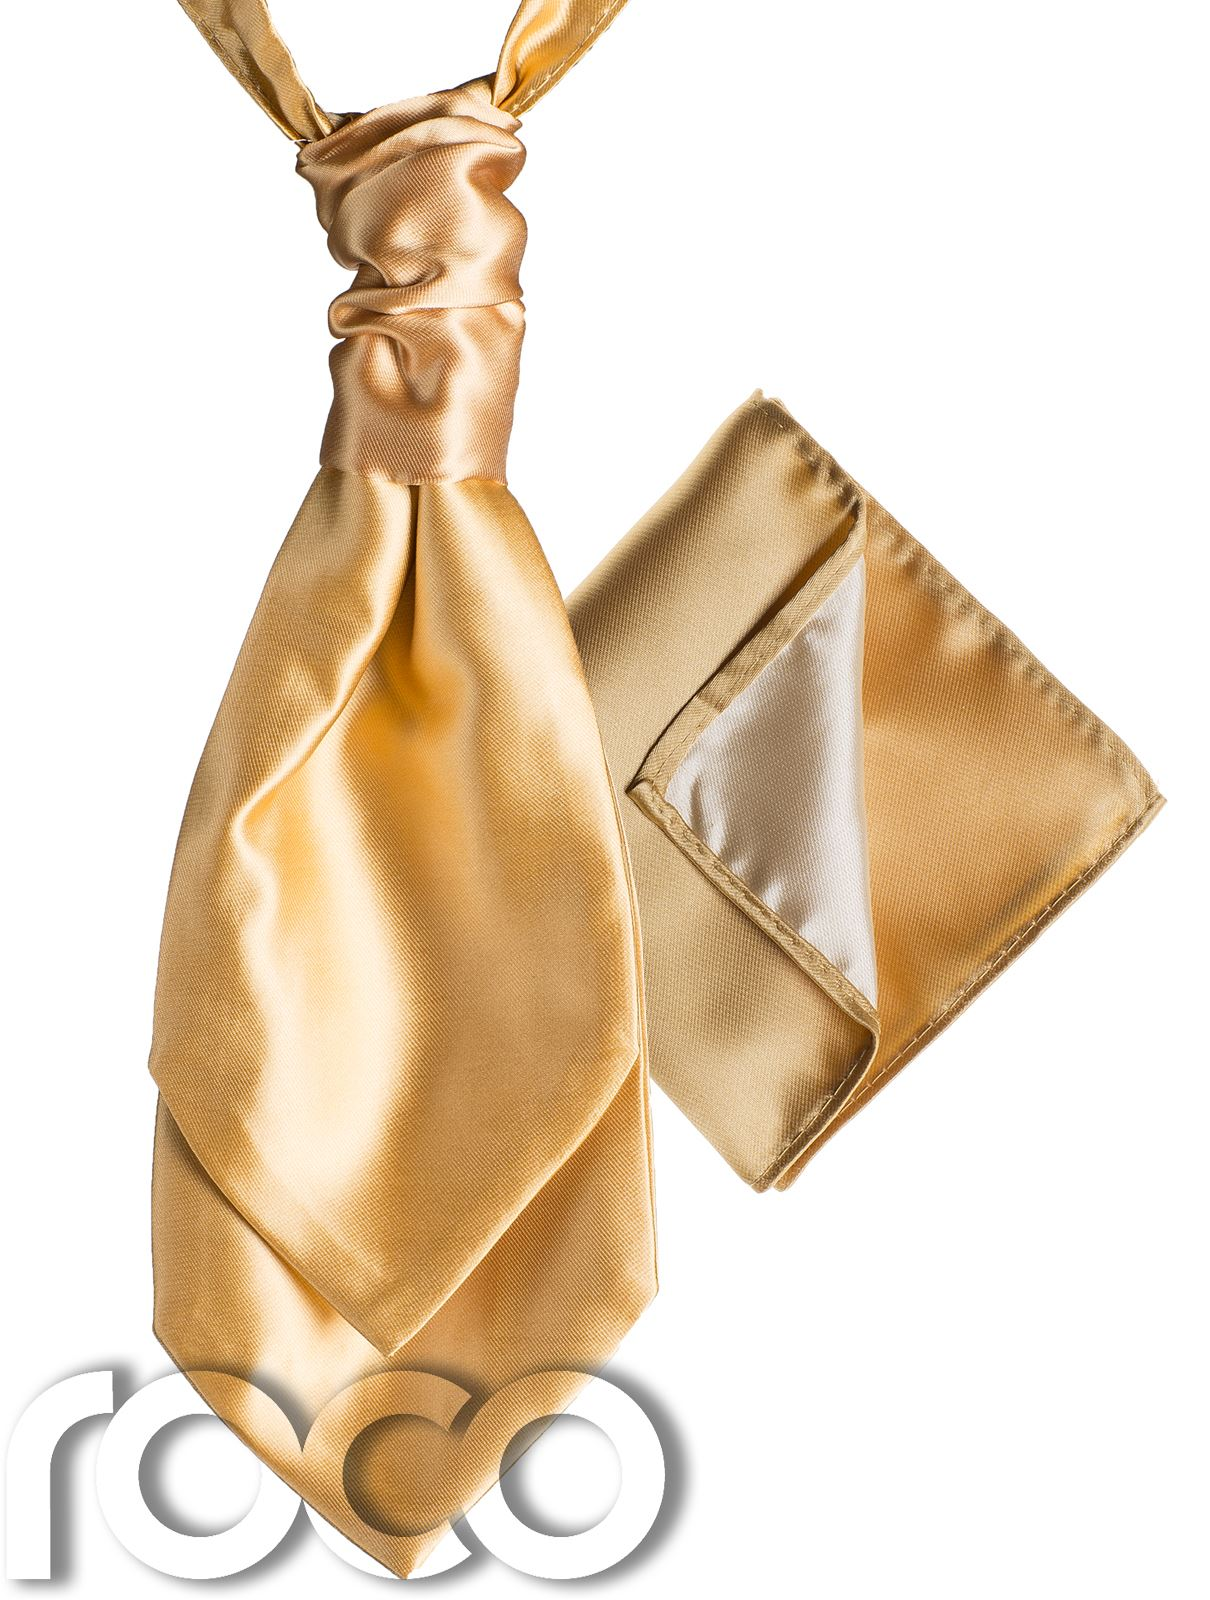 Mens-Satin-Wedding-Ruche-Cravat-Tie-with-hankys-Cravat-for-mens-mens-Cravats thumbnail 5